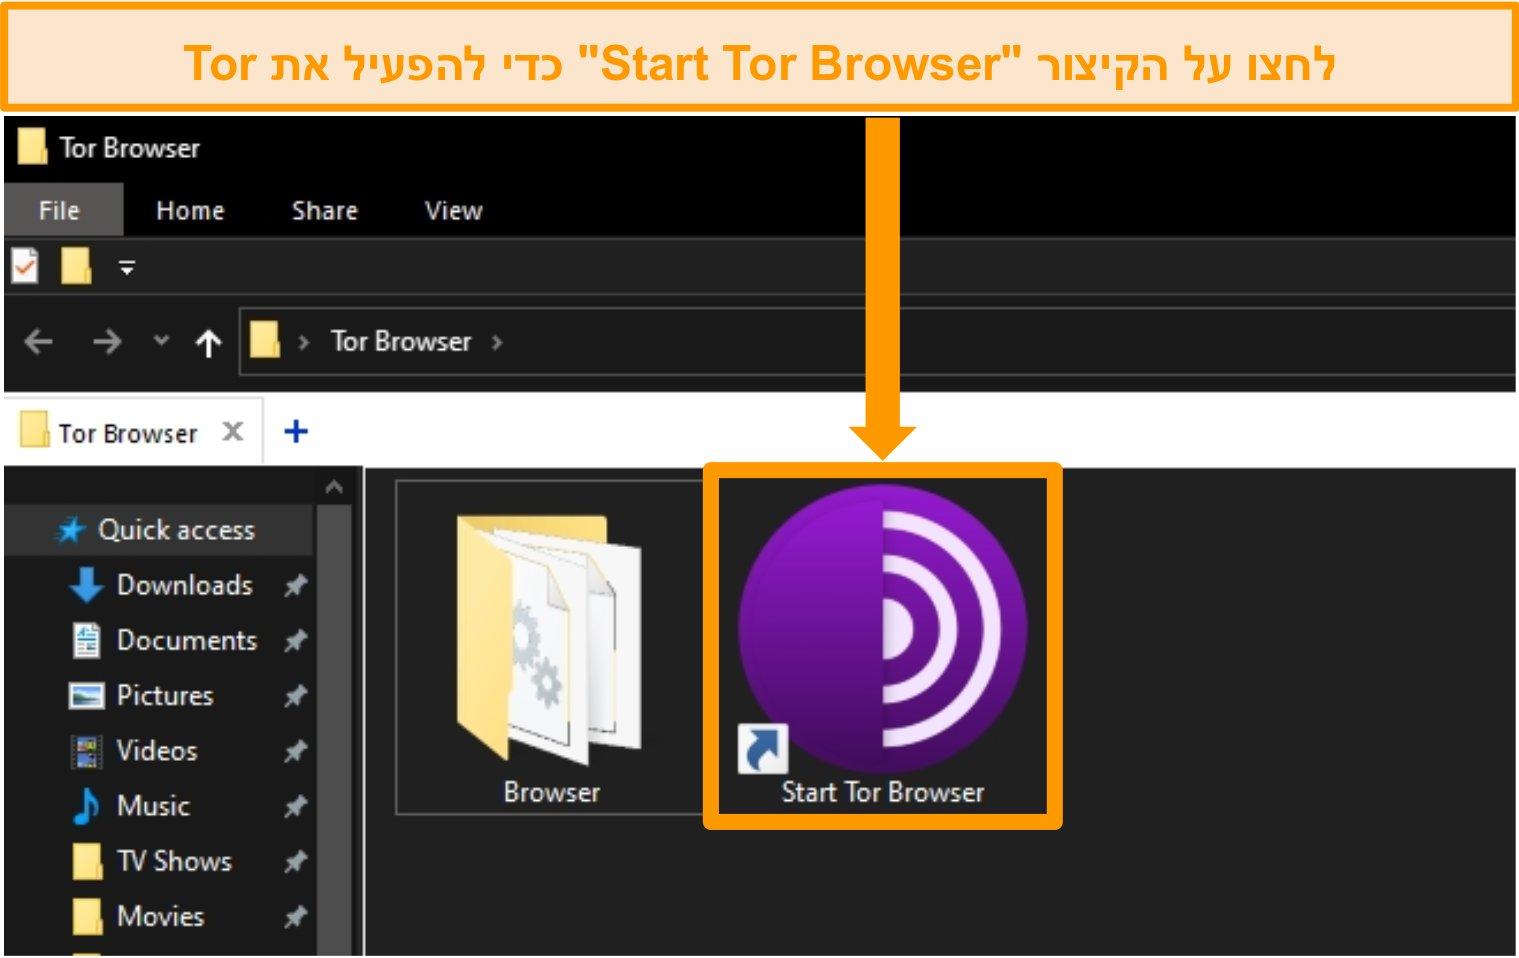 Windows -ב Tor ןפדפד תנקתהל ךרדה רוציק לש ךסמ םוליצ